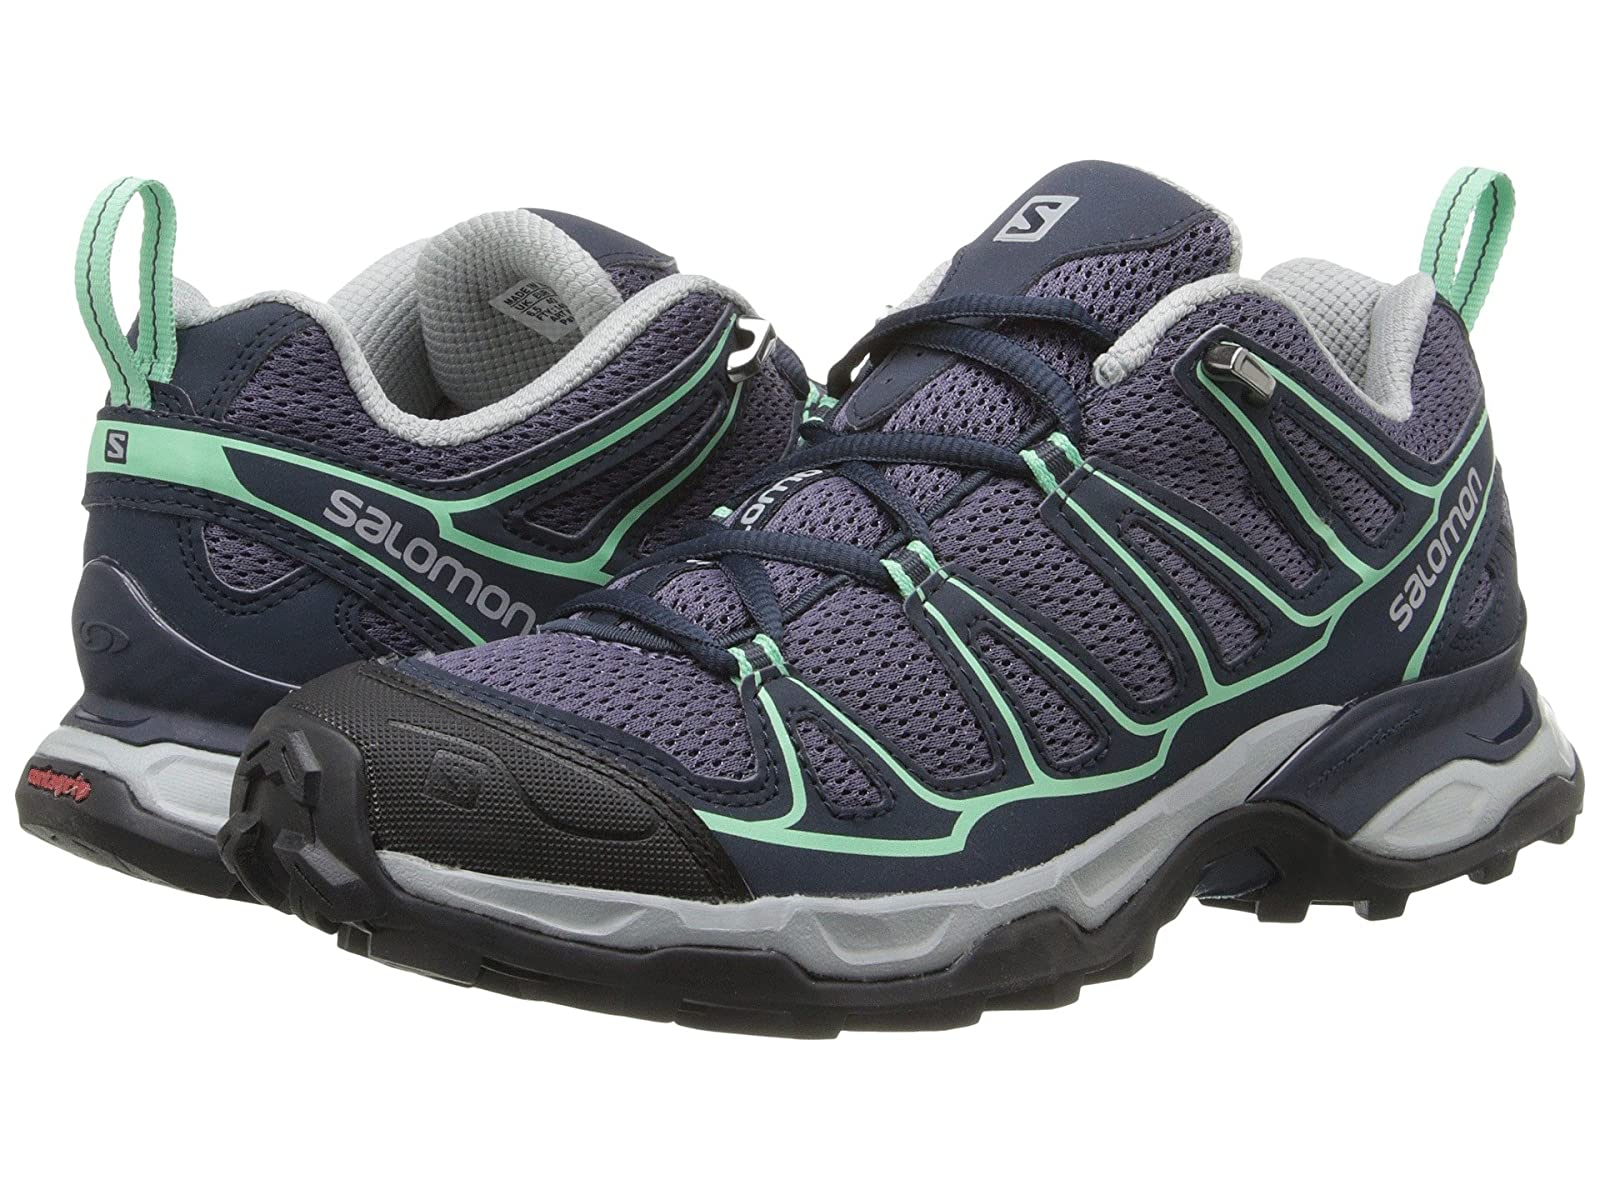 Salomon X Ultra PrimeAtmospheric grades have affordable shoes